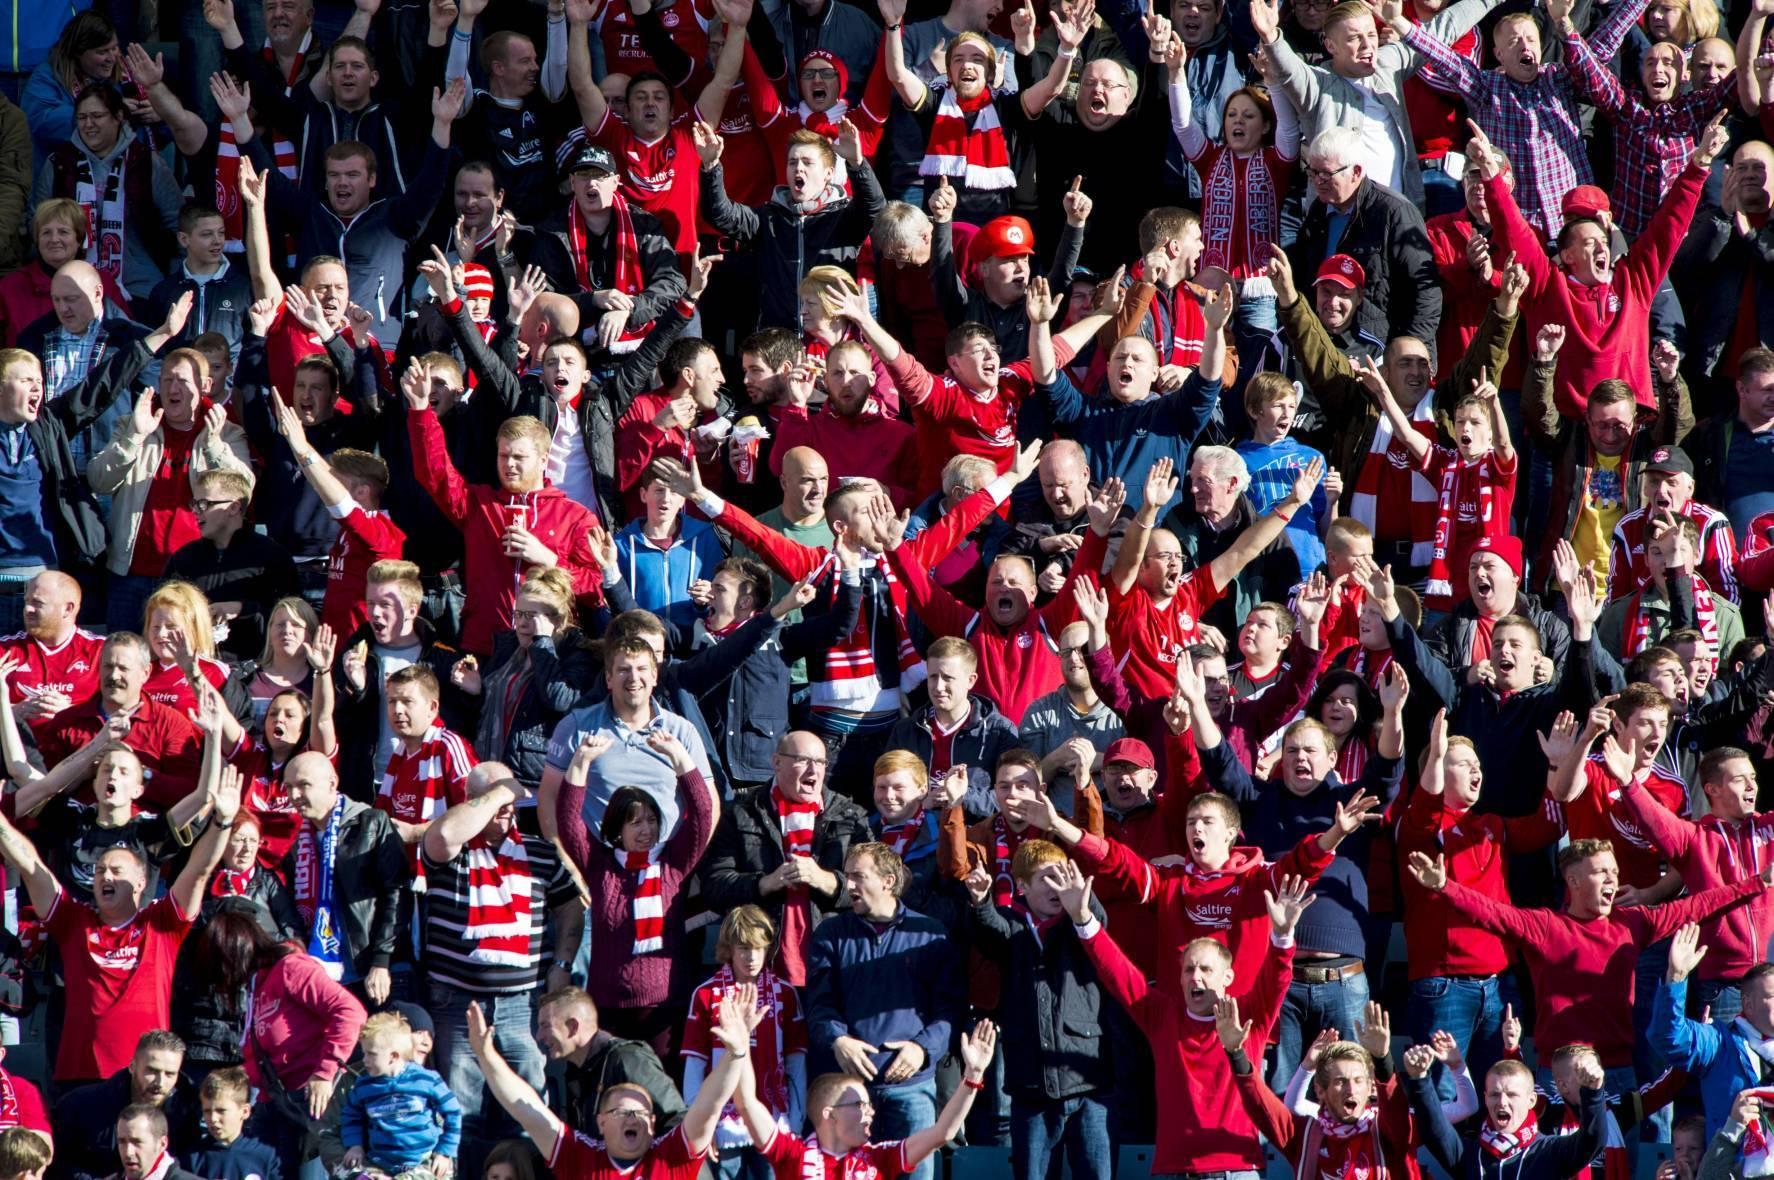 More than 62,000 fans followed Aberdeen FC on their travels this season.